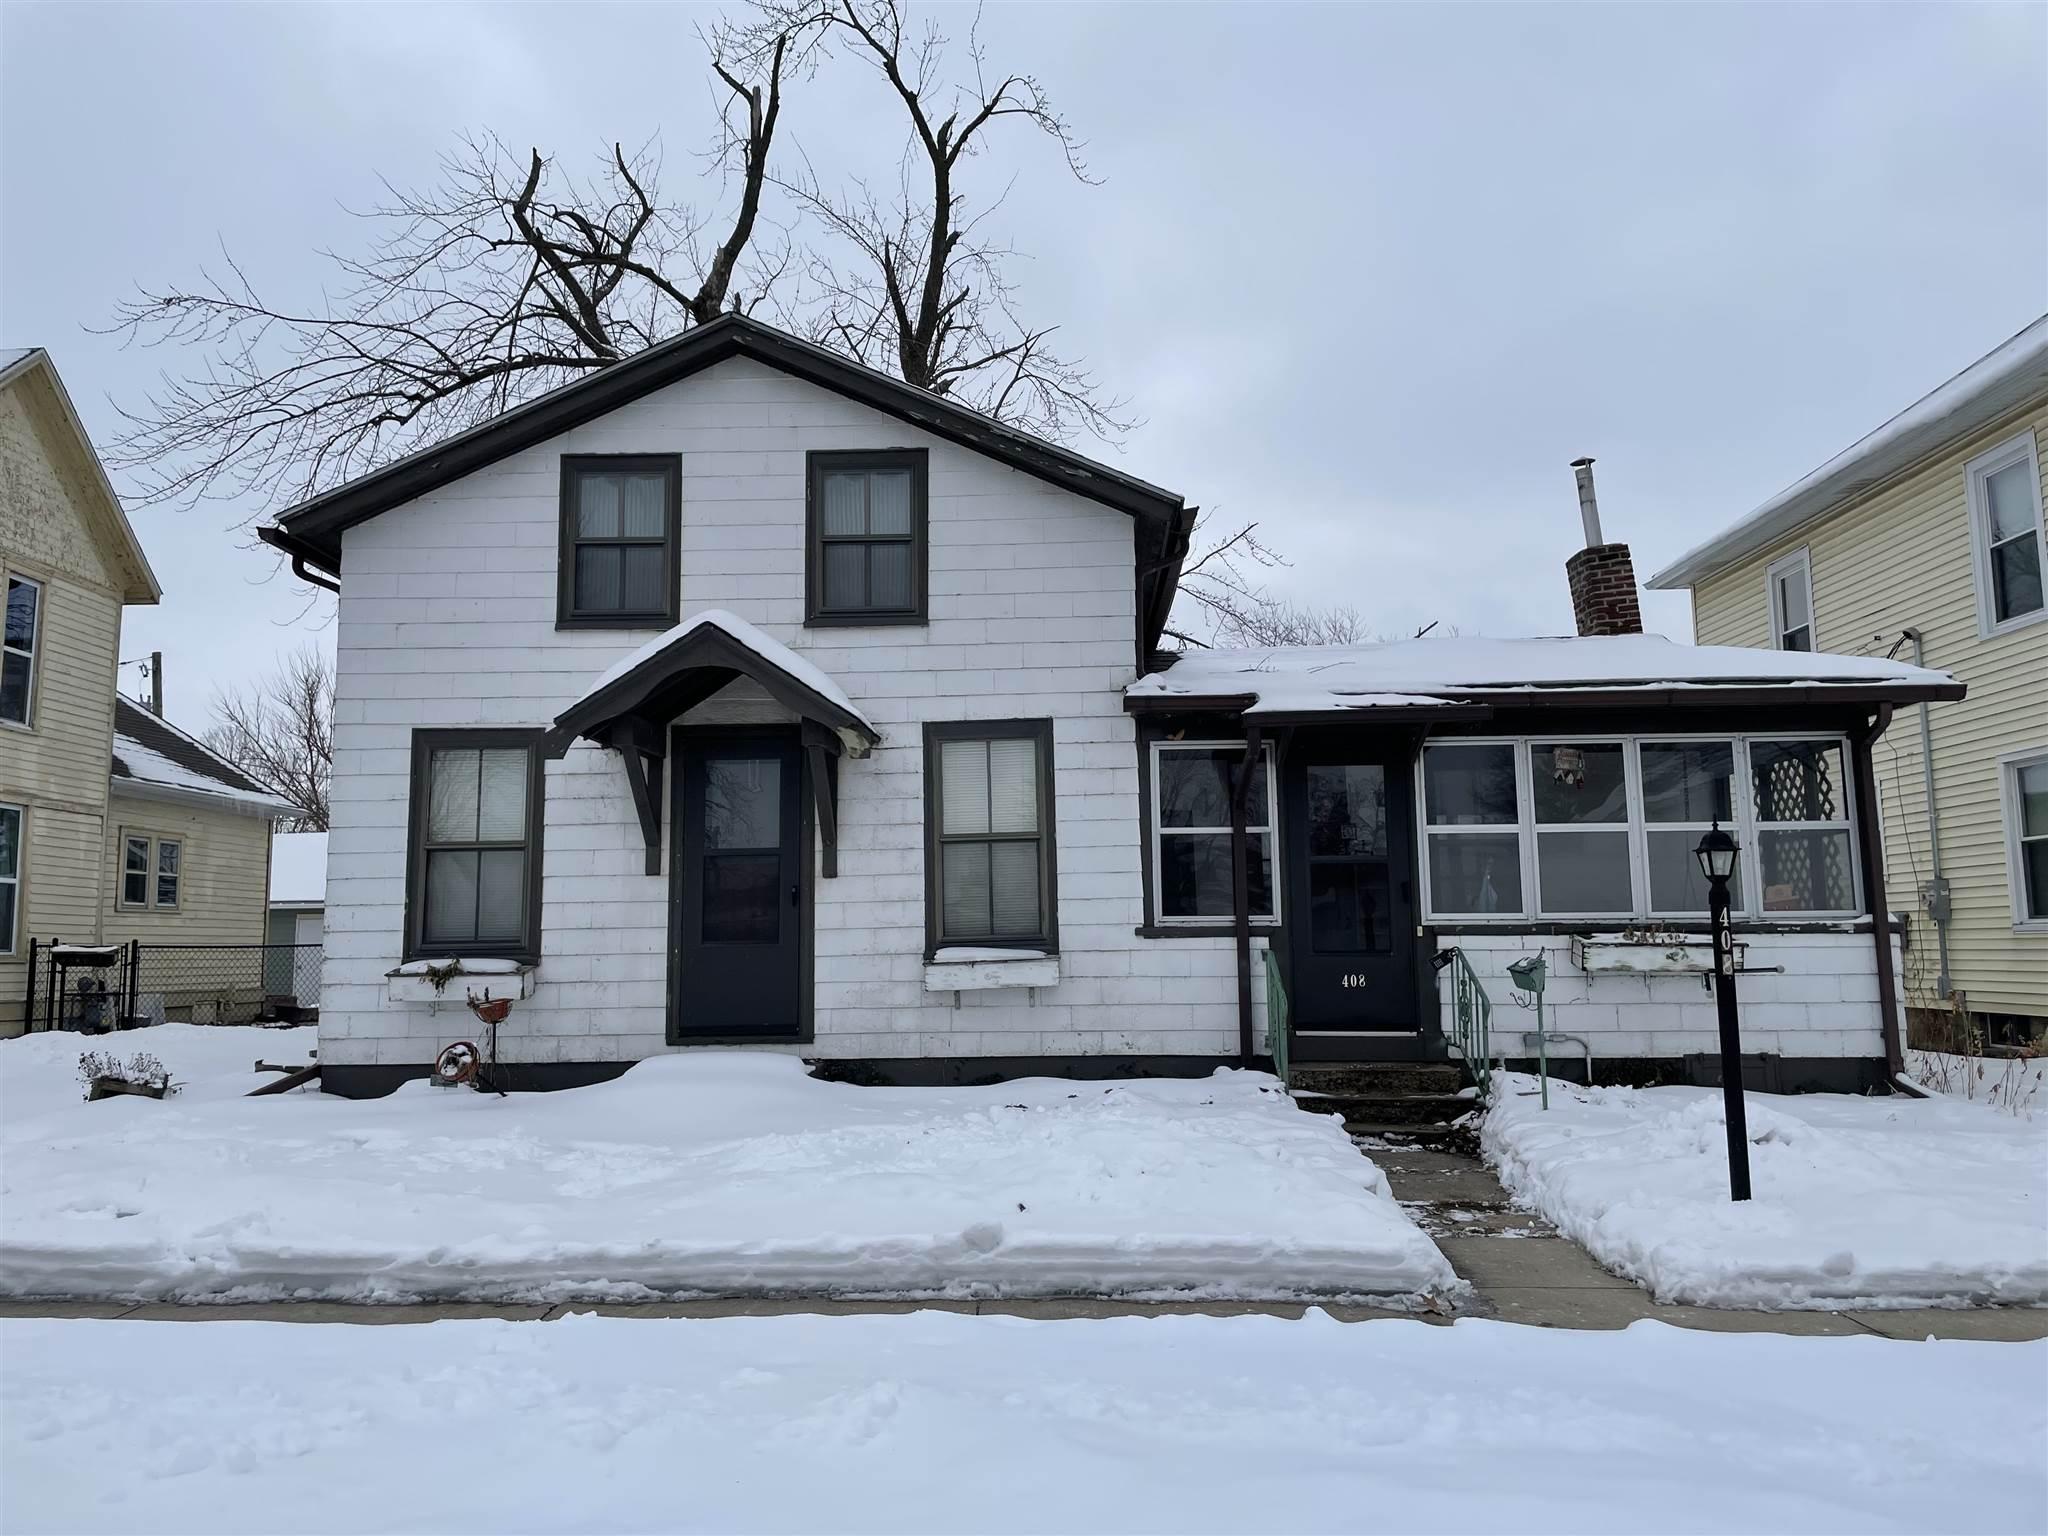 408 15TH Property Photo - Fulton, IL real estate listing